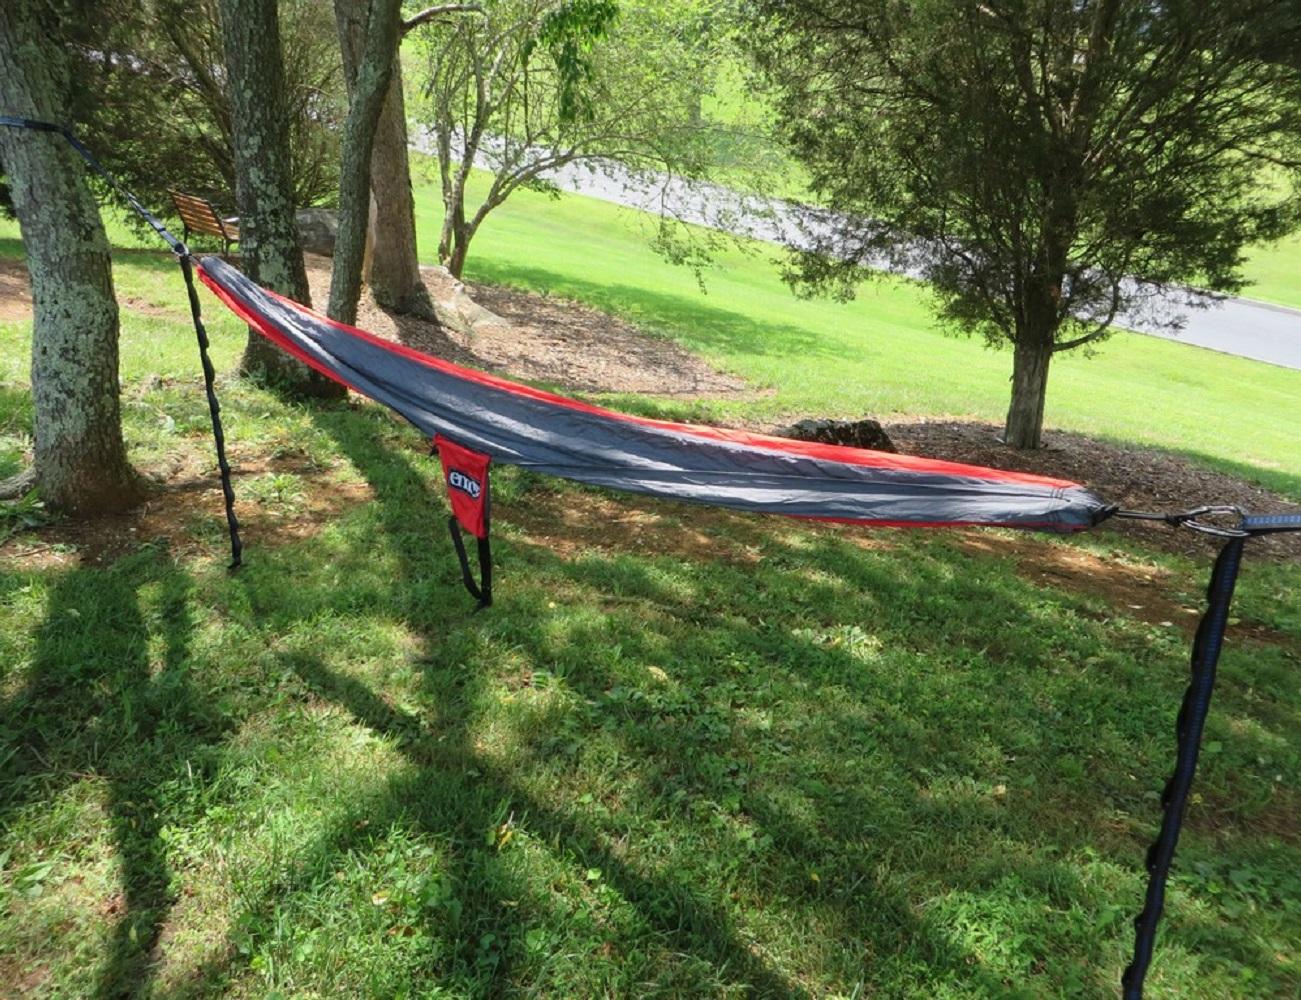 Singlenest Hammock By Eagles Nest Outfitters Gadget Flow